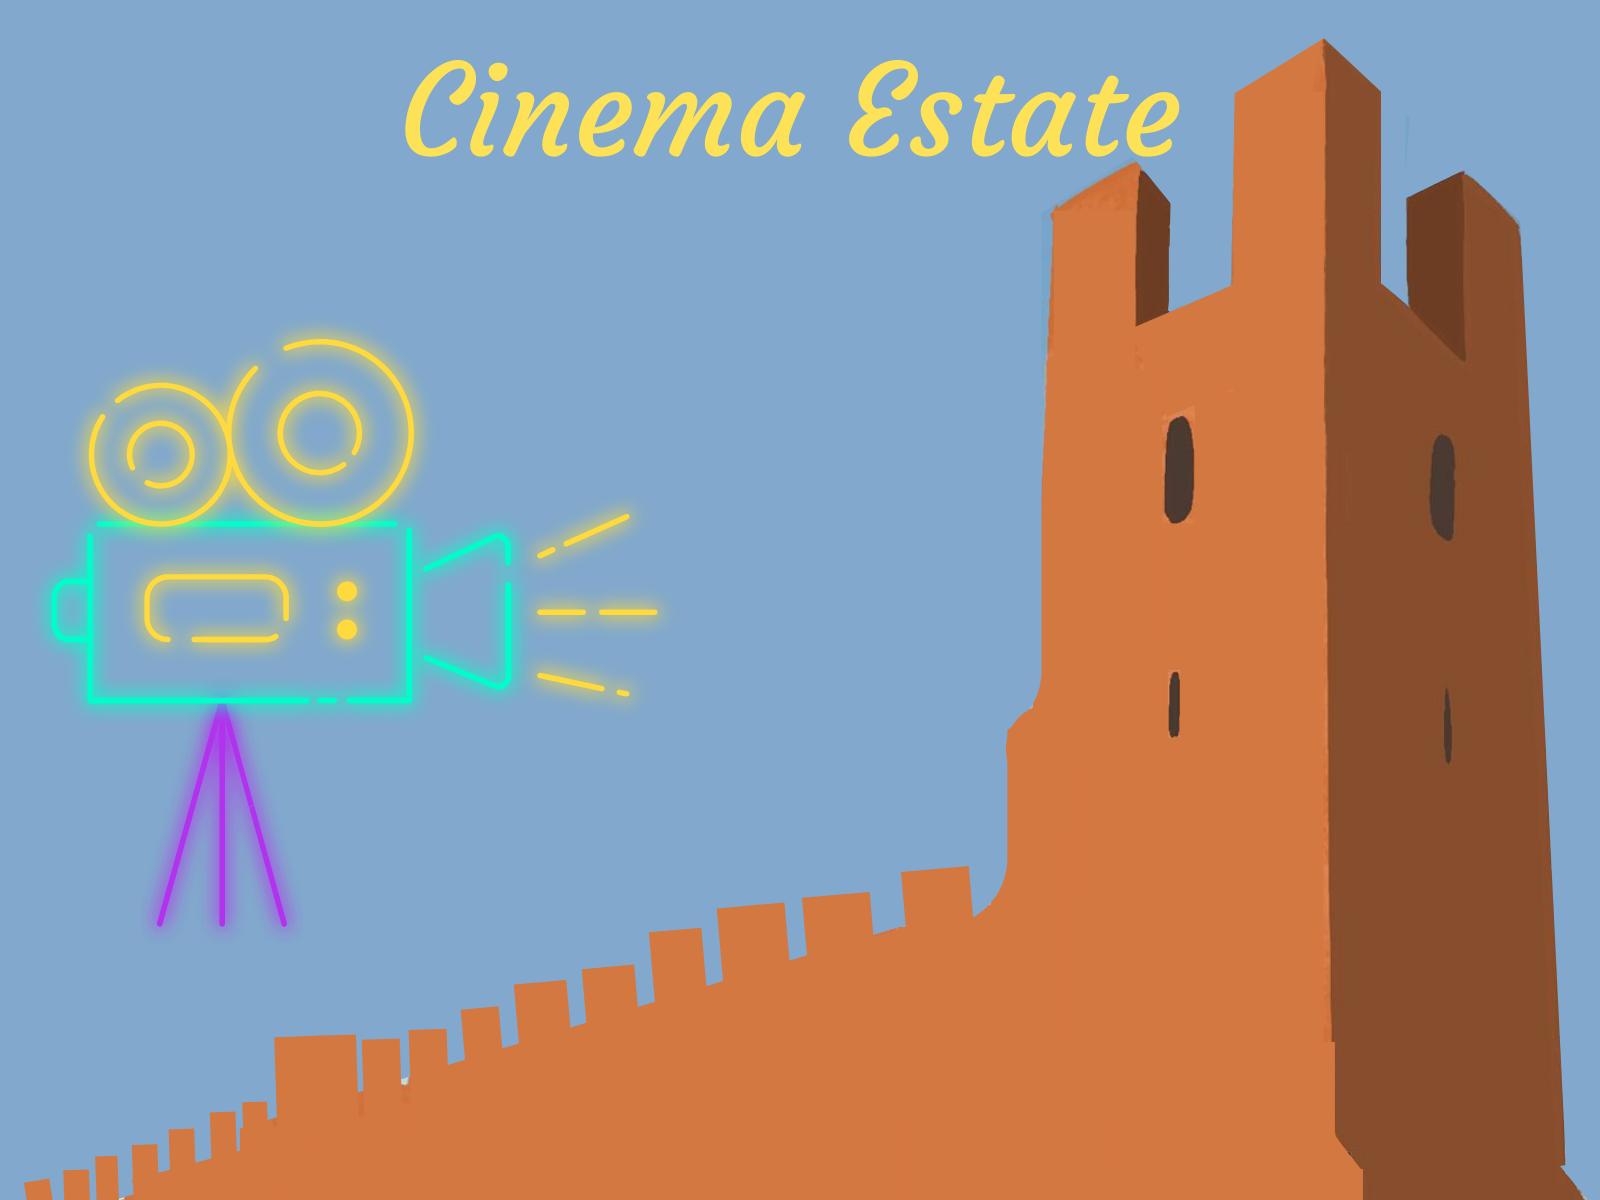 Cinema Estate